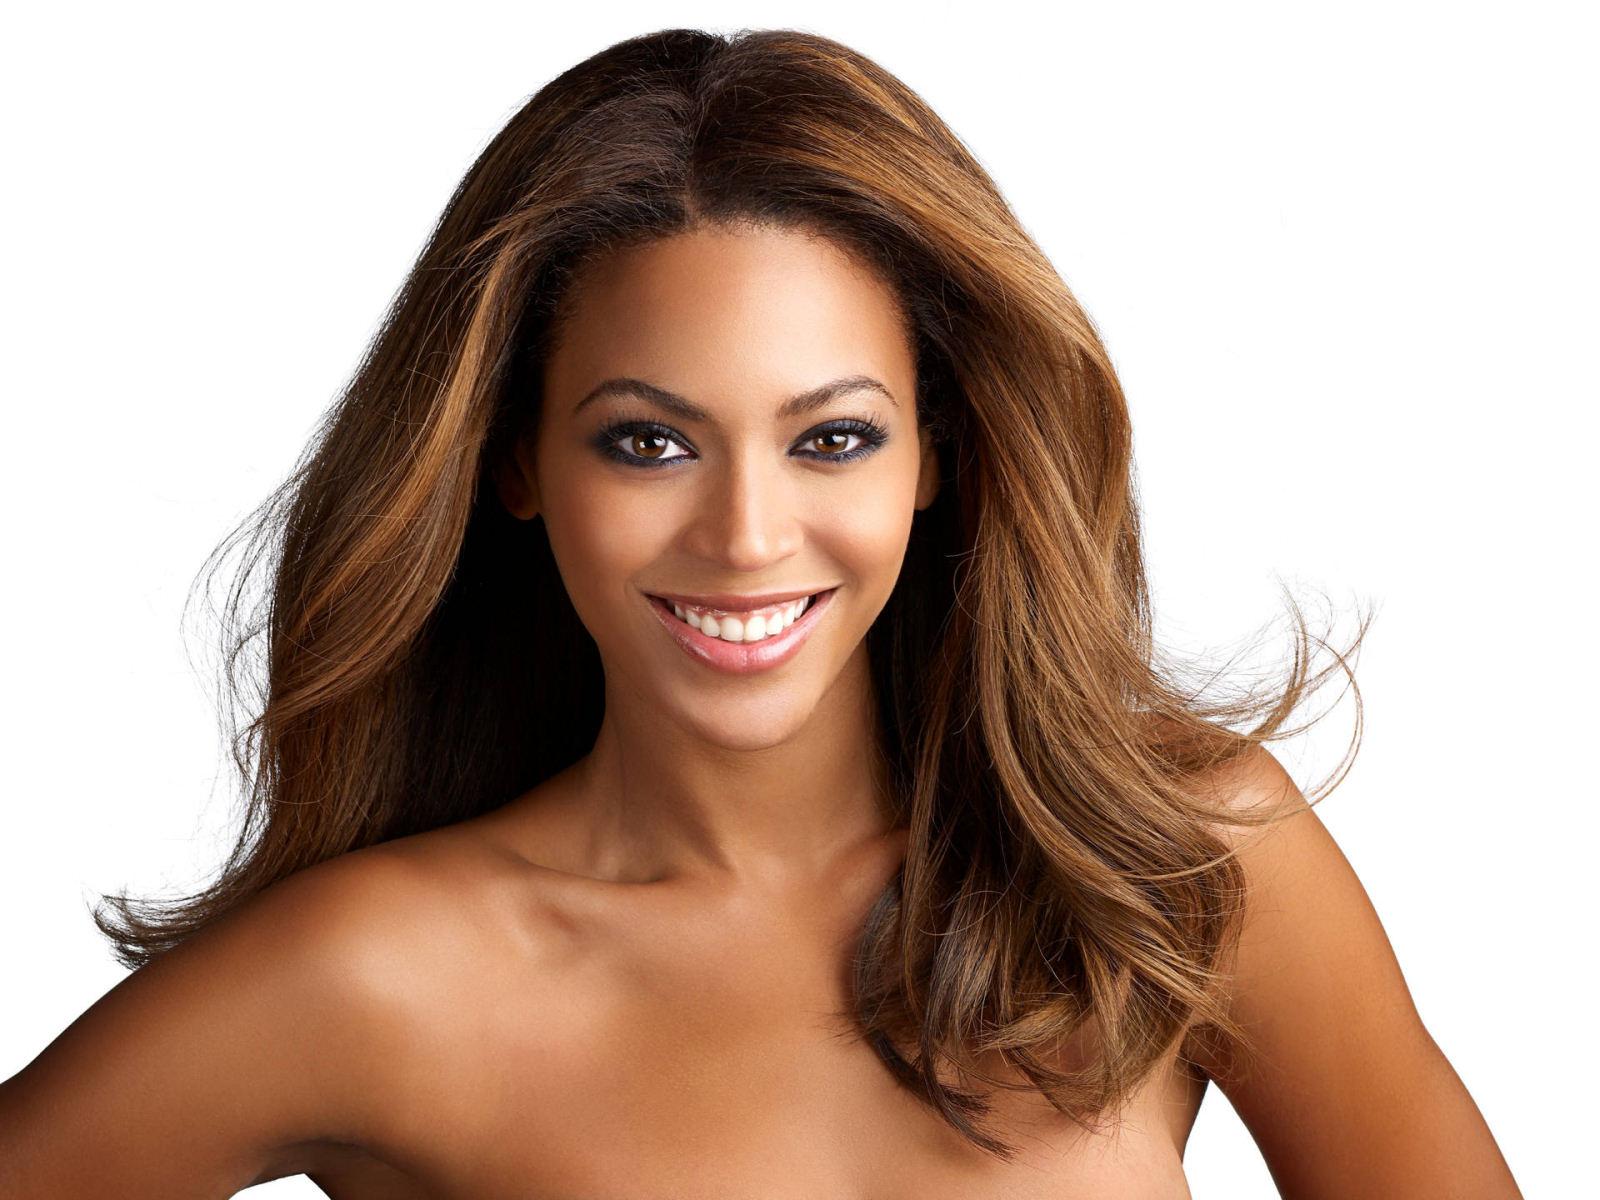 http://1.bp.blogspot.com/-kmewbHGP-Rc/TfkFSHvY4jI/AAAAAAAAALs/NjvrPuLO3XQ/s1600/Beyonce-005-1600x1200.jpg